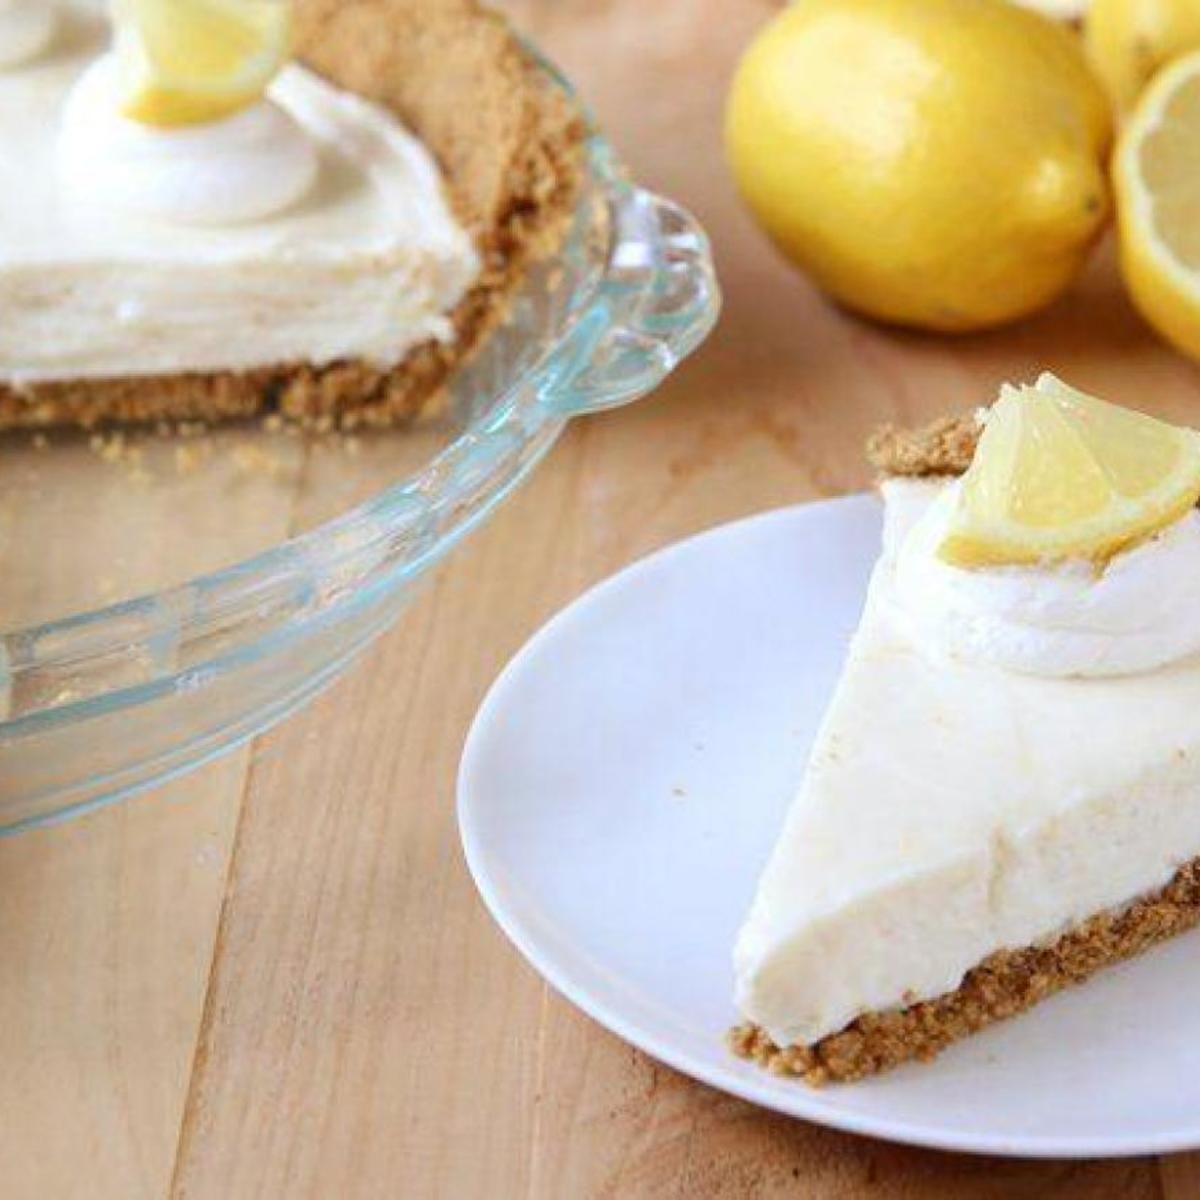 Nobake Lemon Icebox Pie From Betty Crocker